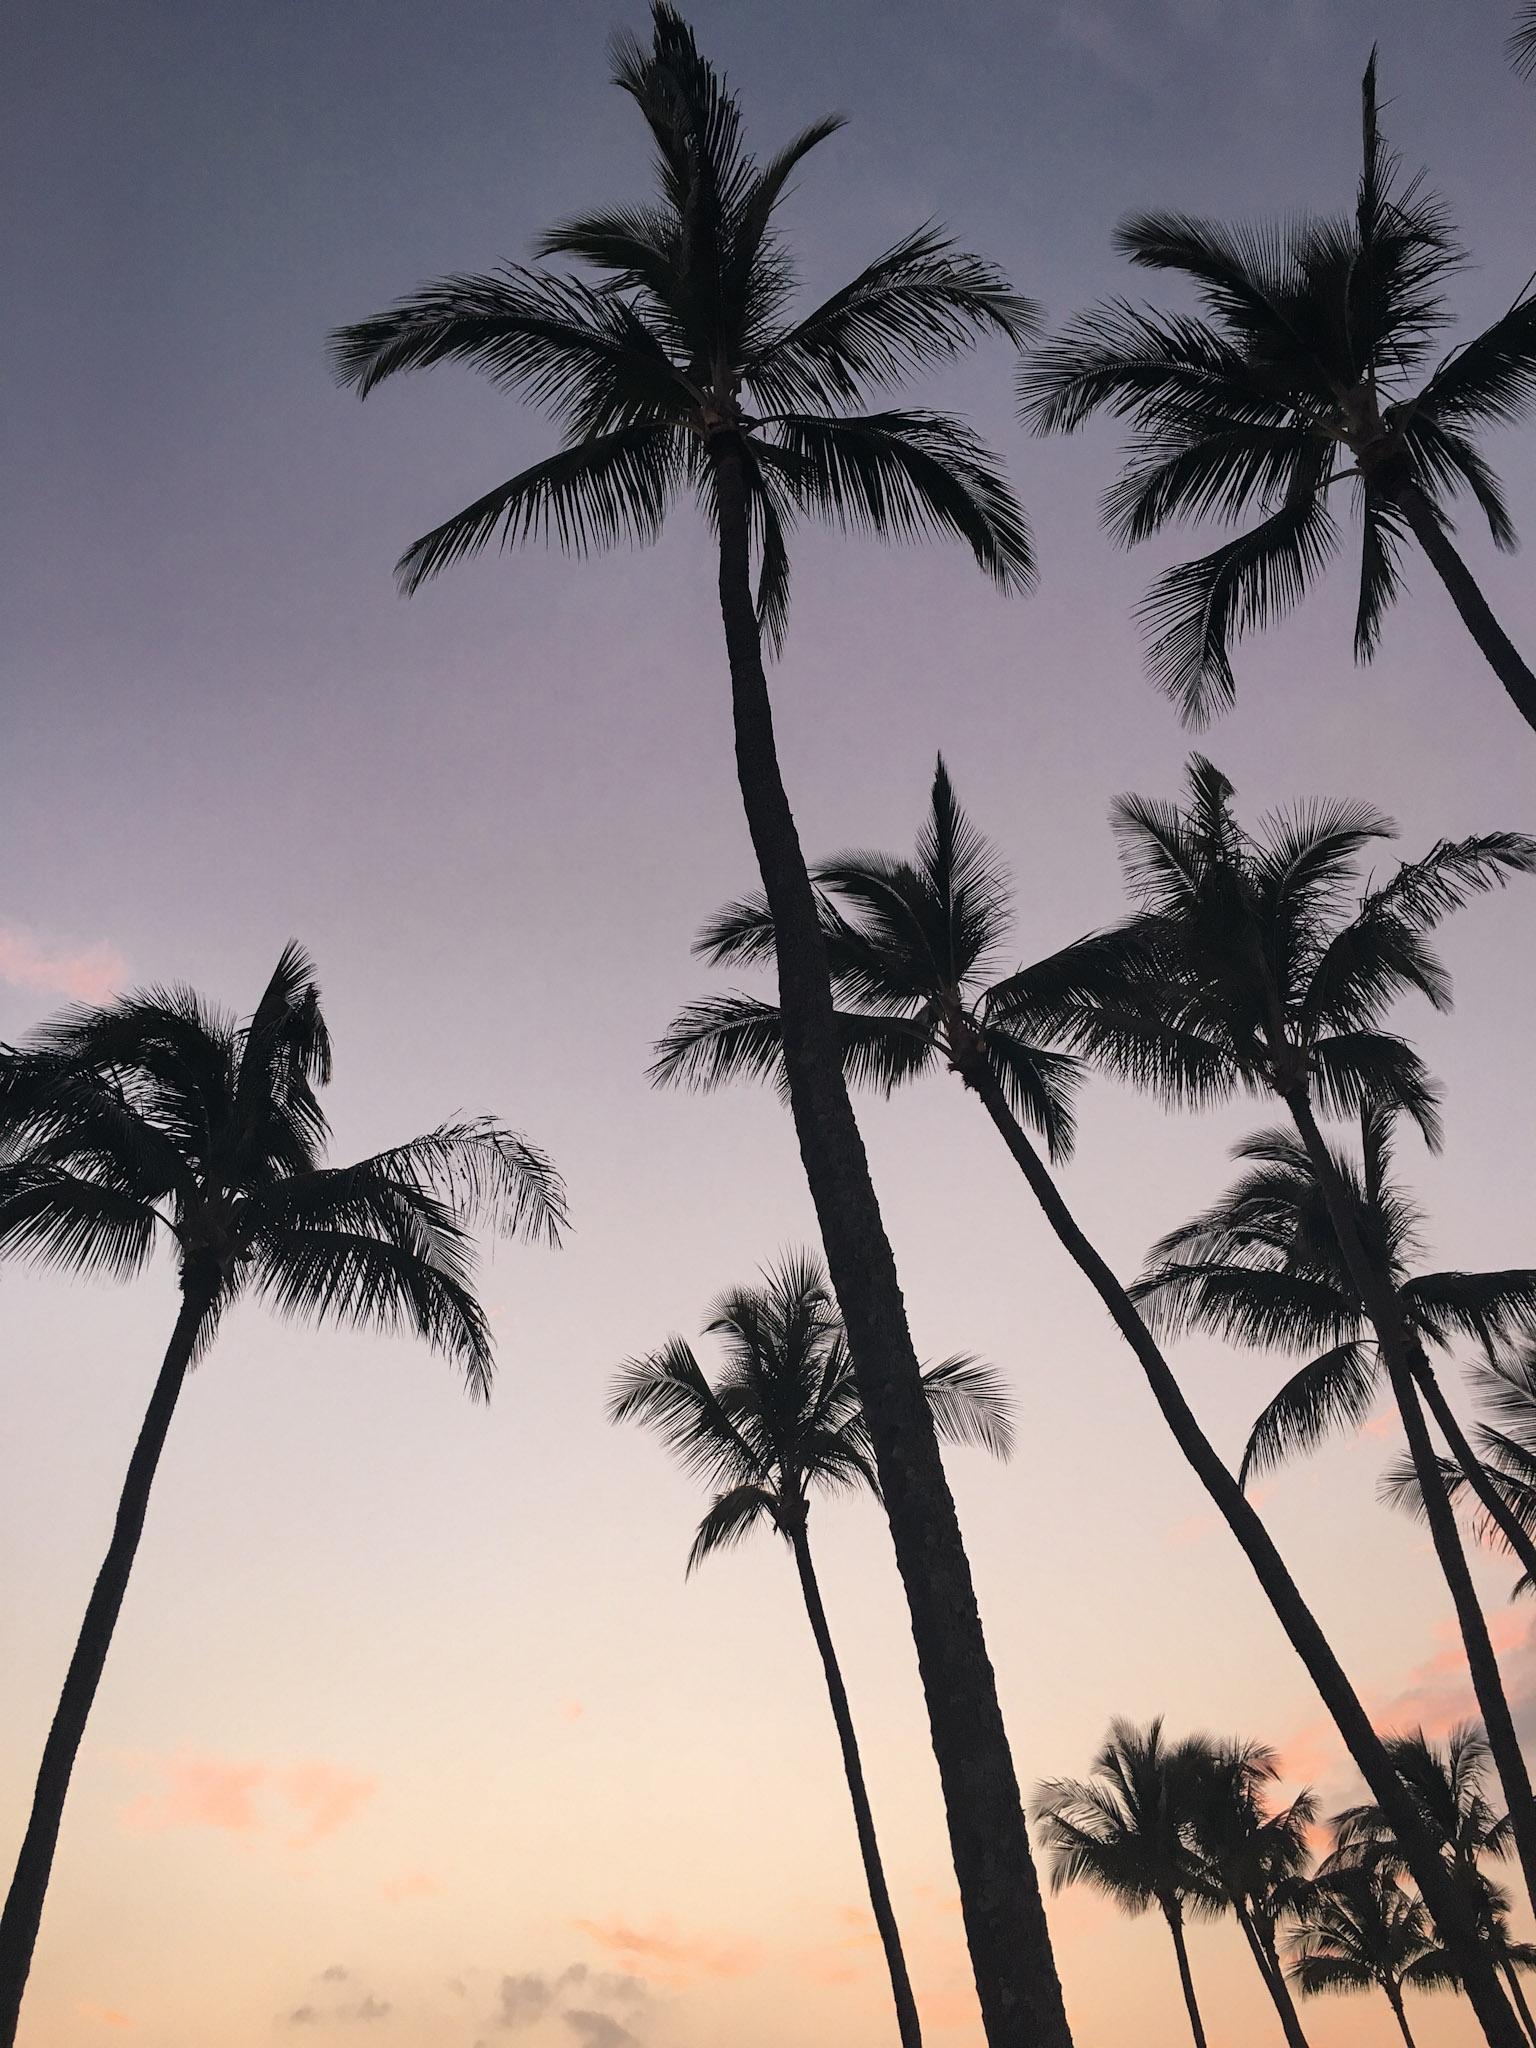 curio.trips.hawaii.palm.sunset.jpg